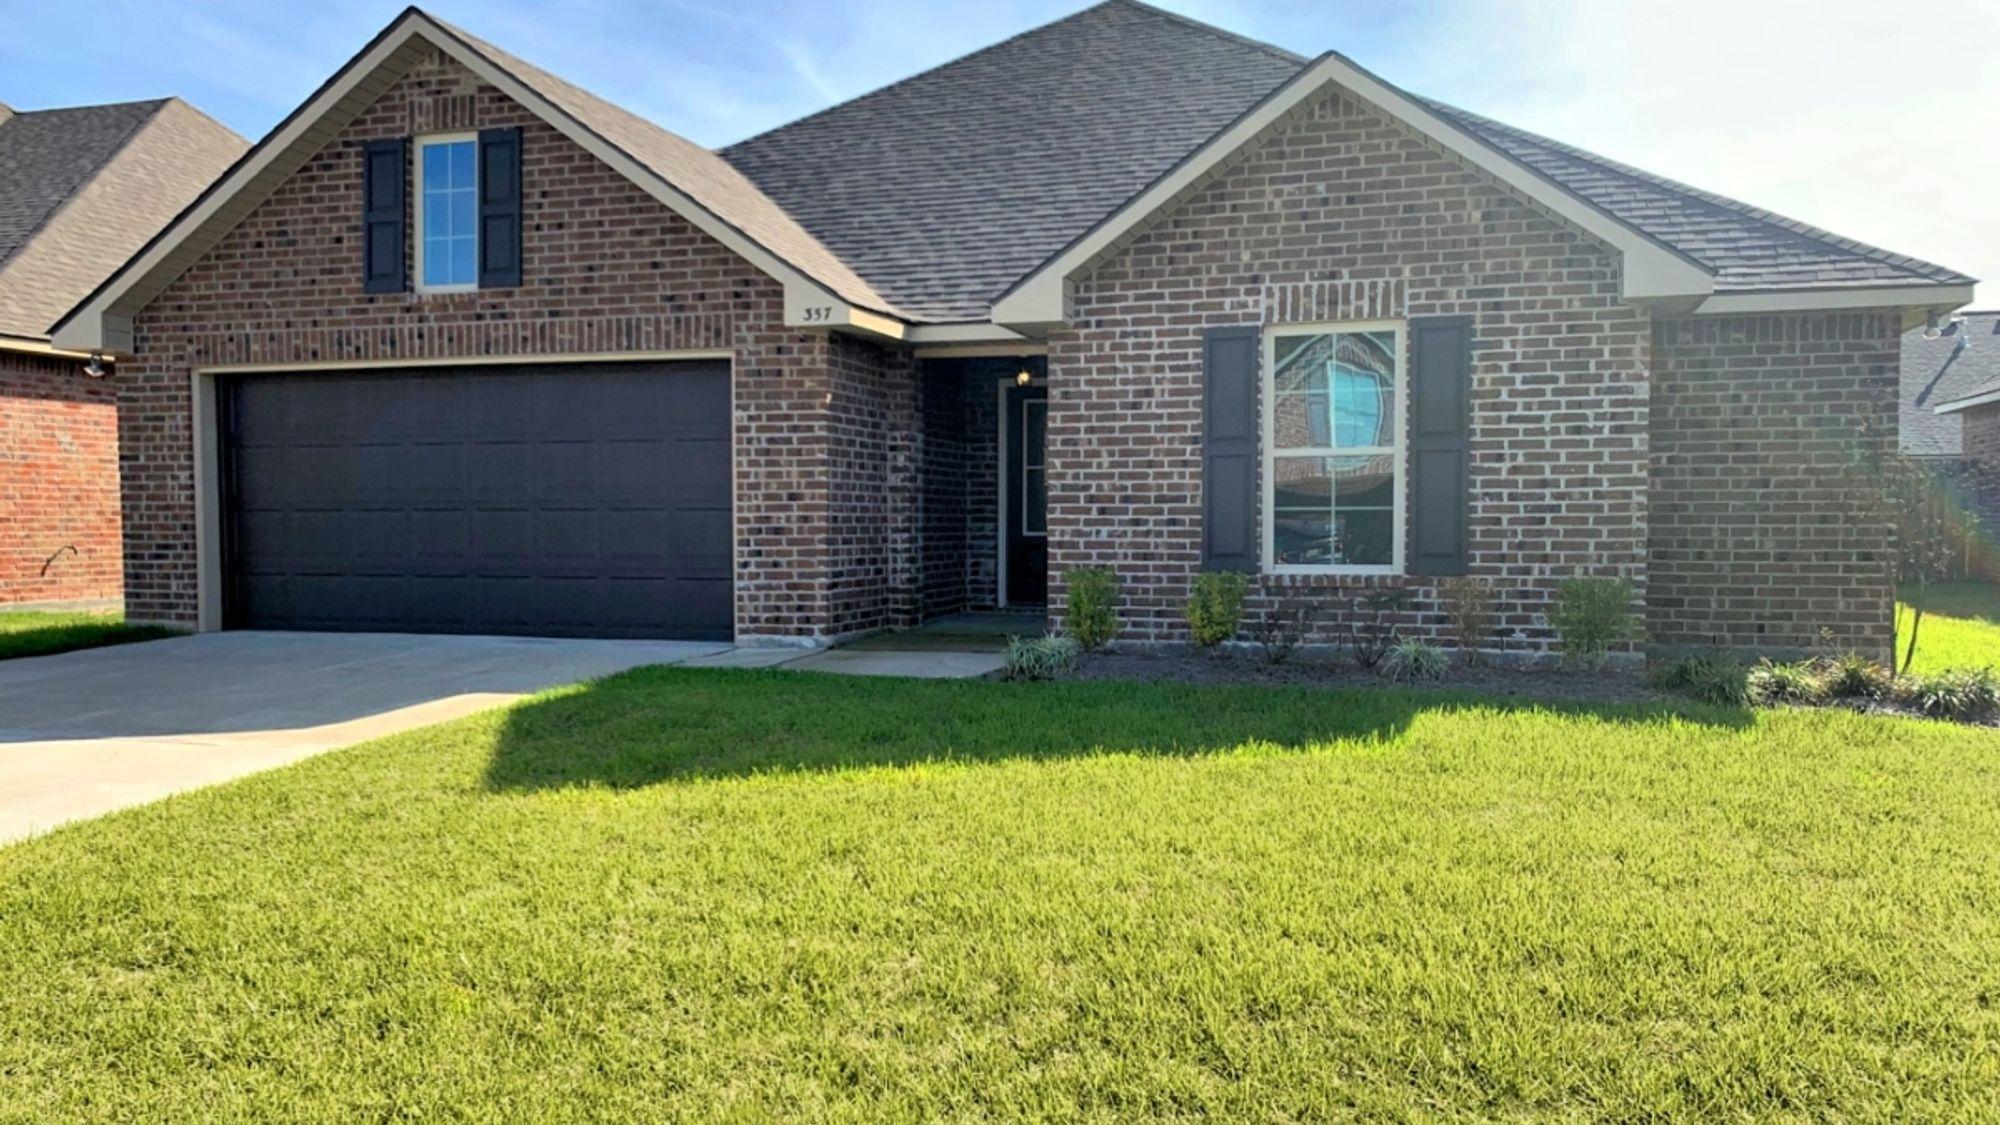 Front View - Hudson III A - Belle Savanne Community - DSLD Homes - Sulphur